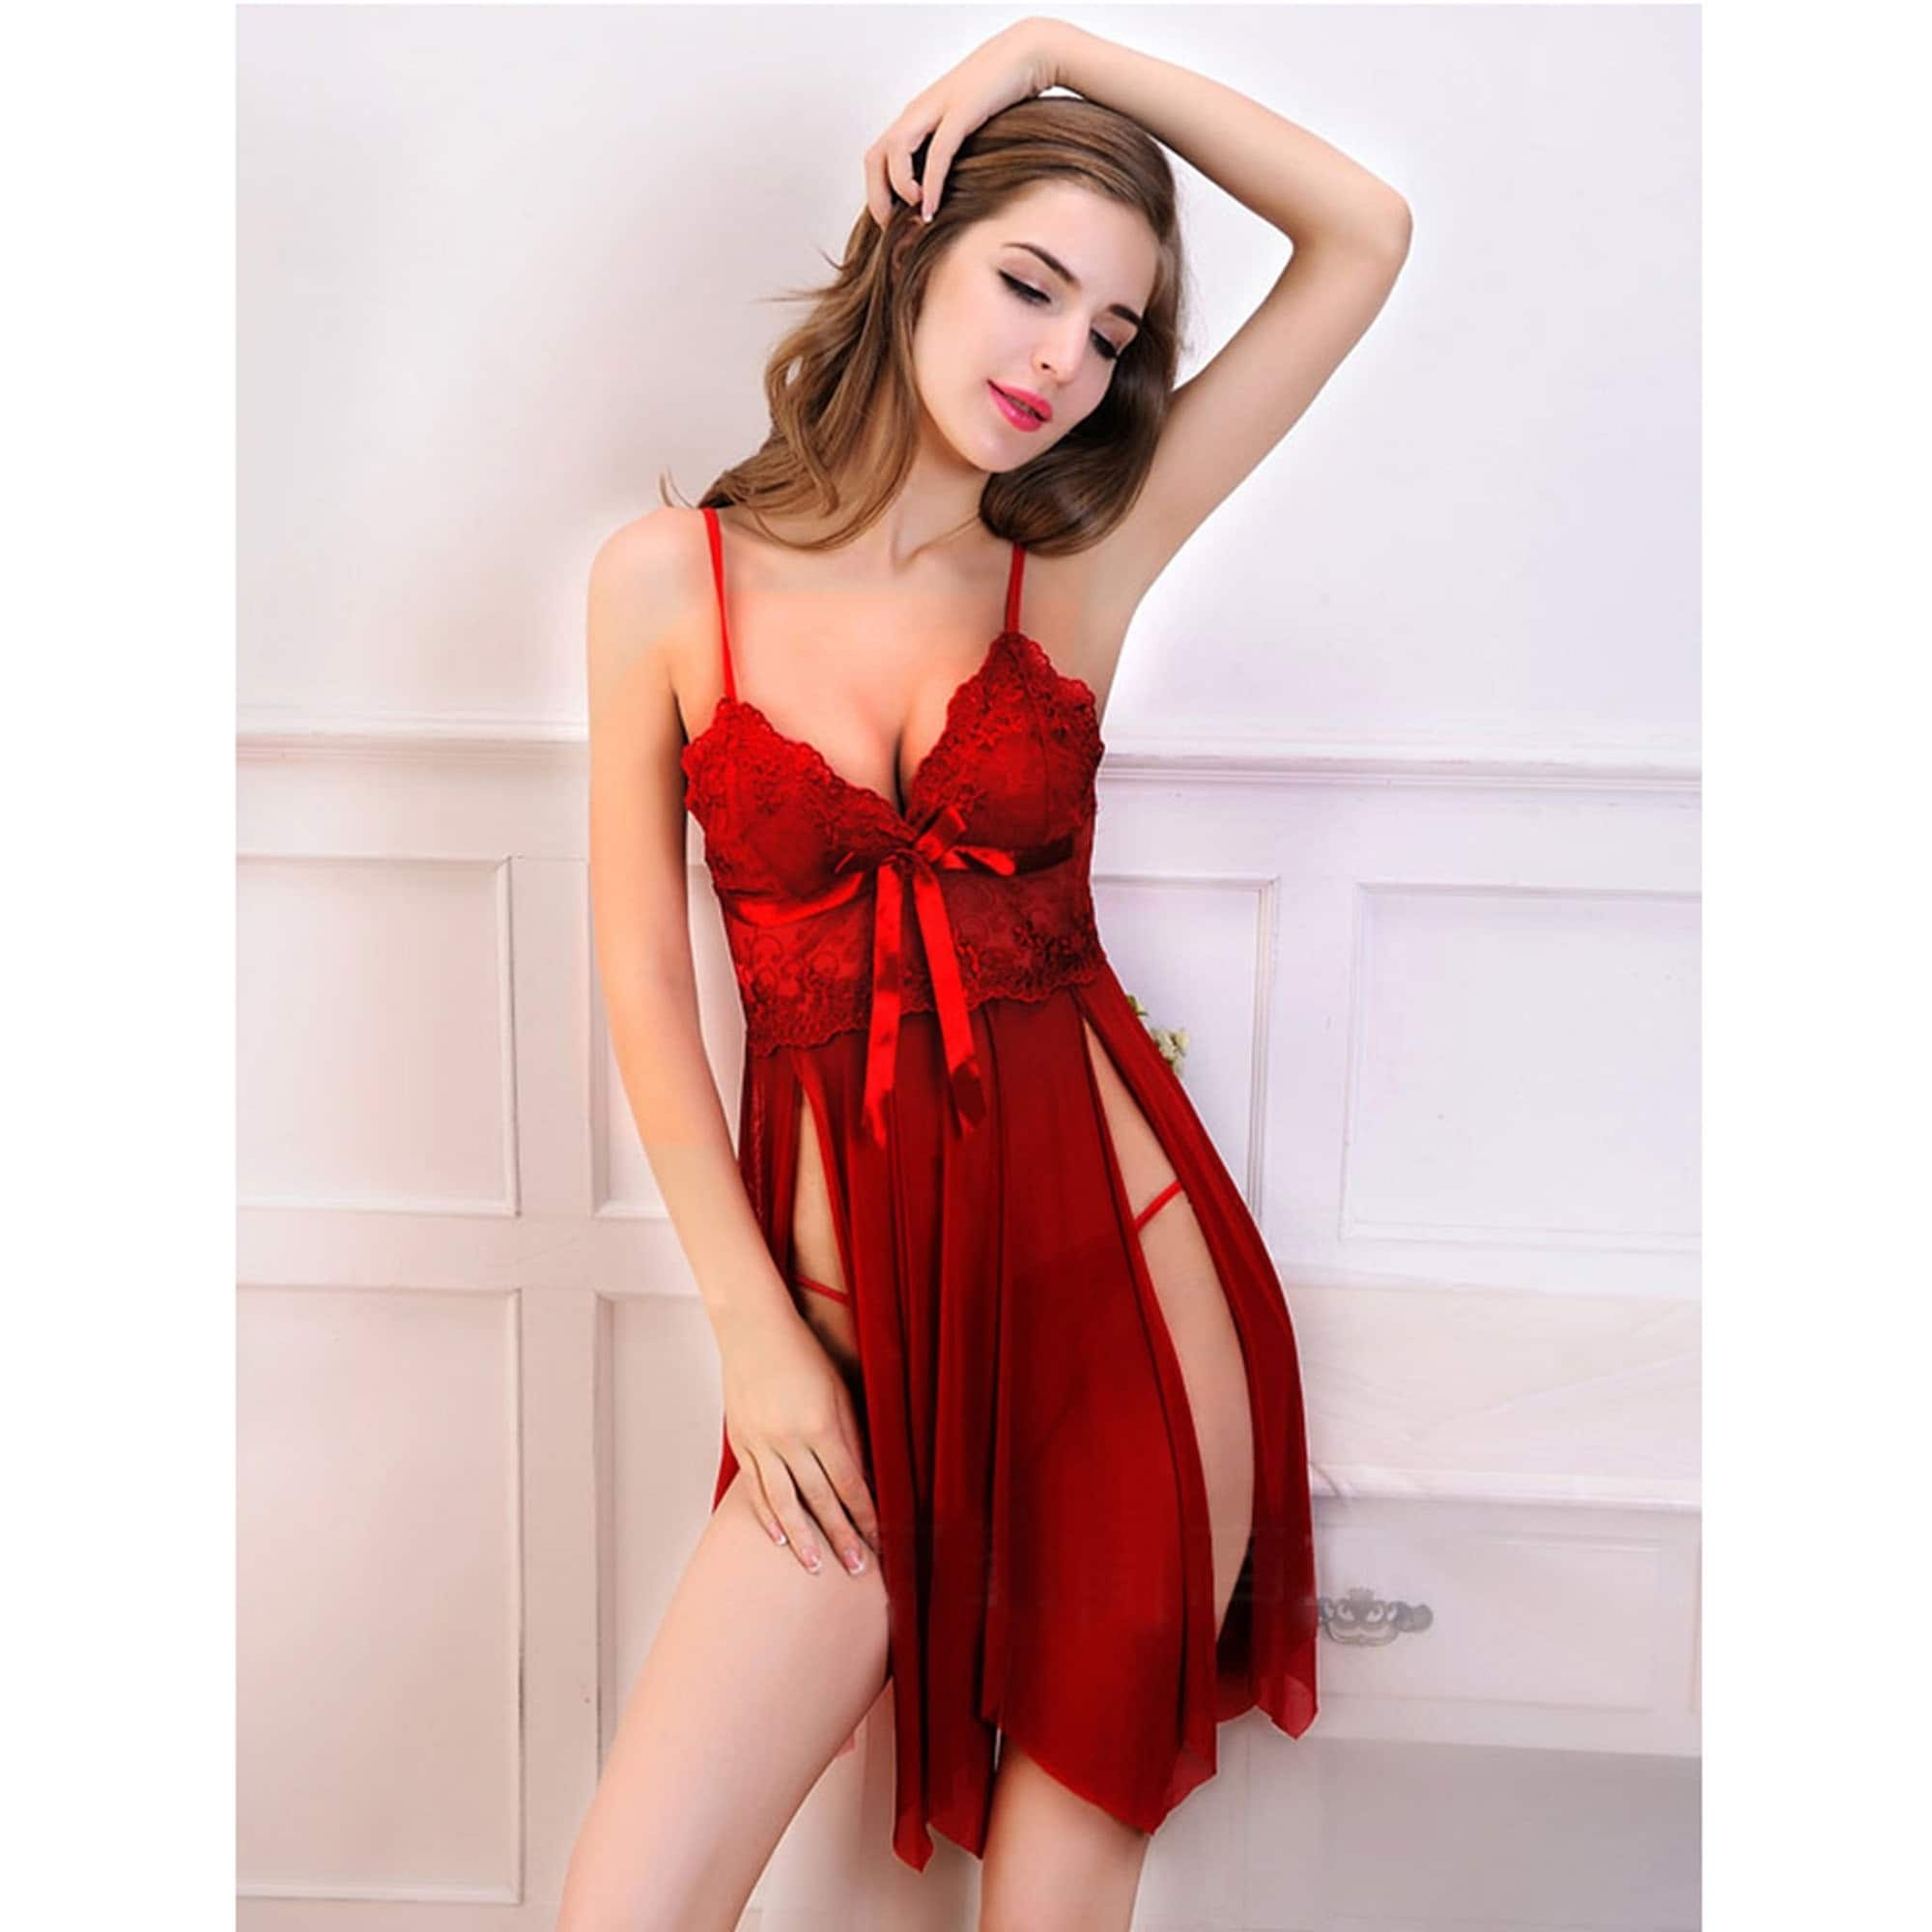 dfea0ae721ba Shop Acappella Sexy Sleep Dress Mesh Floral Lace Satin Bow - Free ...